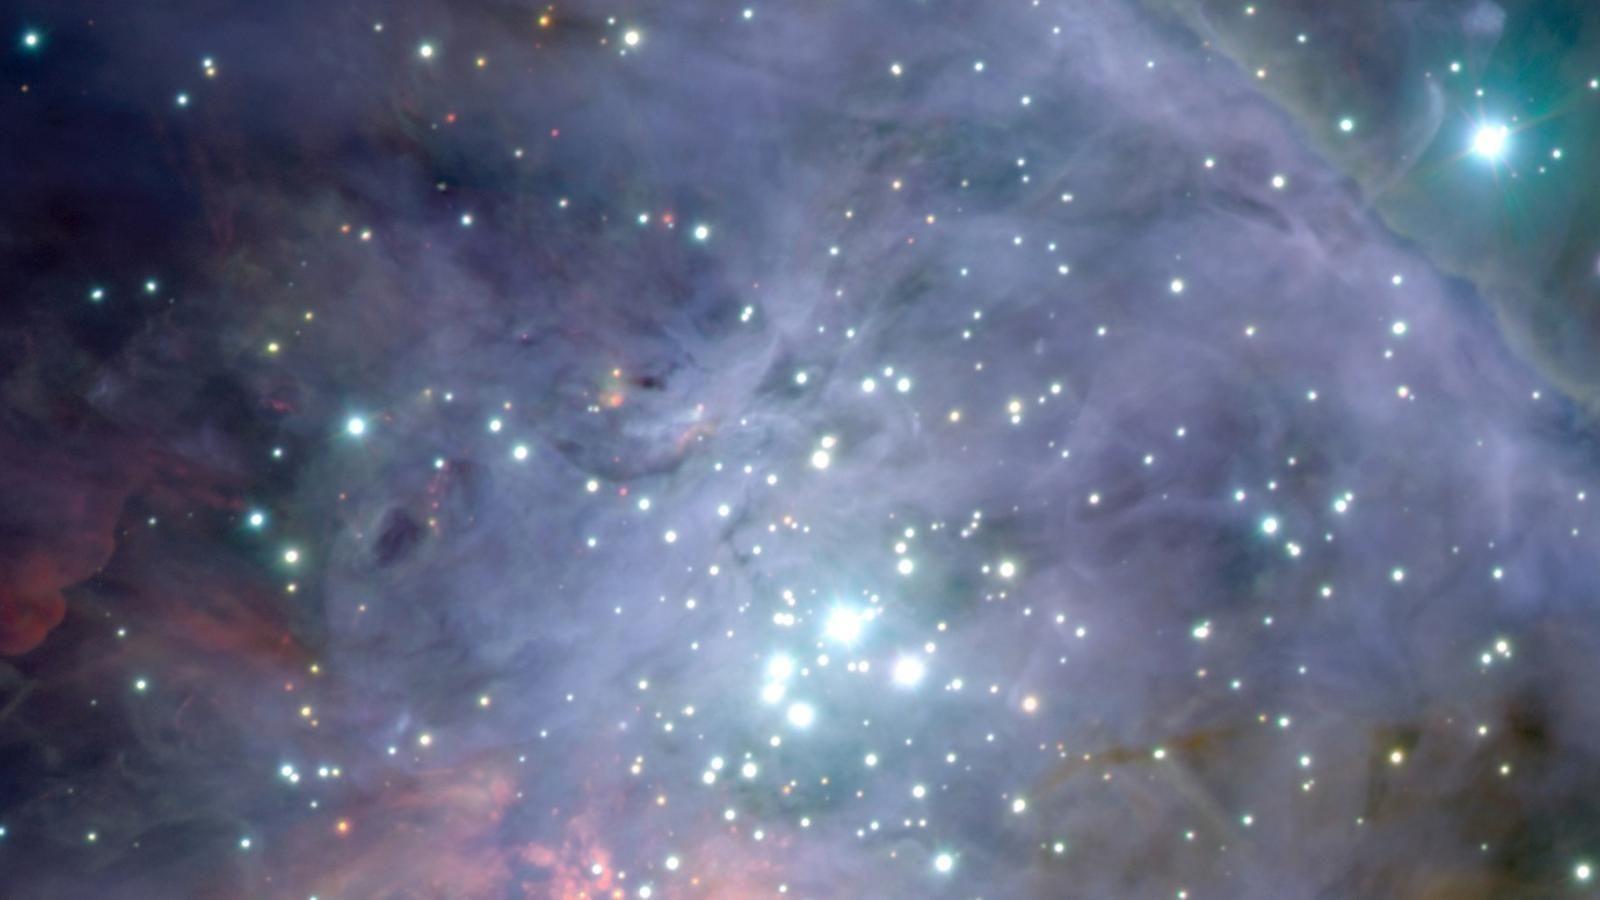 Hd wallpaper universe - Stars Space Cosmos Universe Hd Wallpaper 16403 Hq Desktop